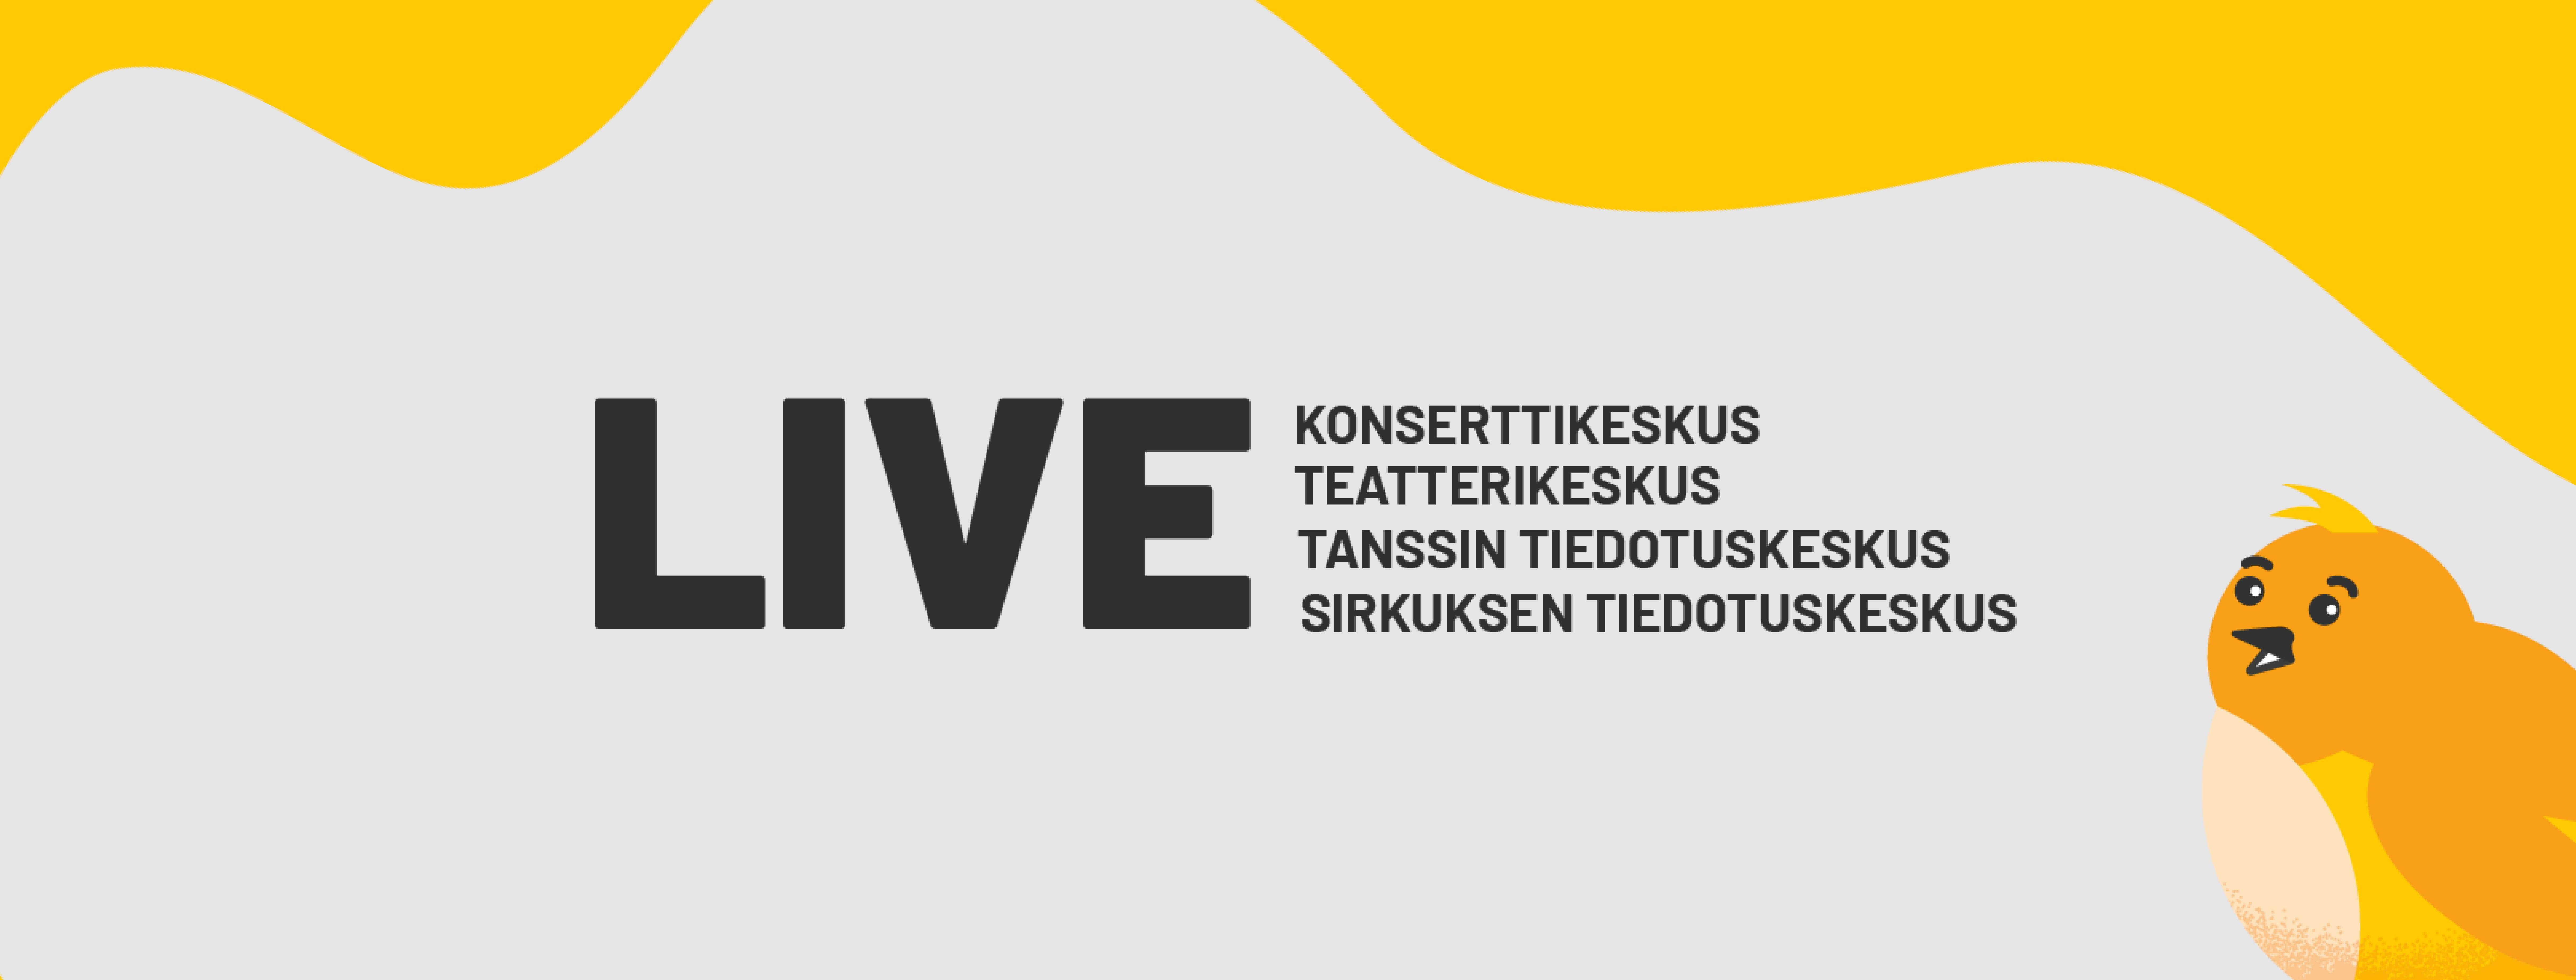 Live-hanke kuvituskuva, jossa logo ja lintu